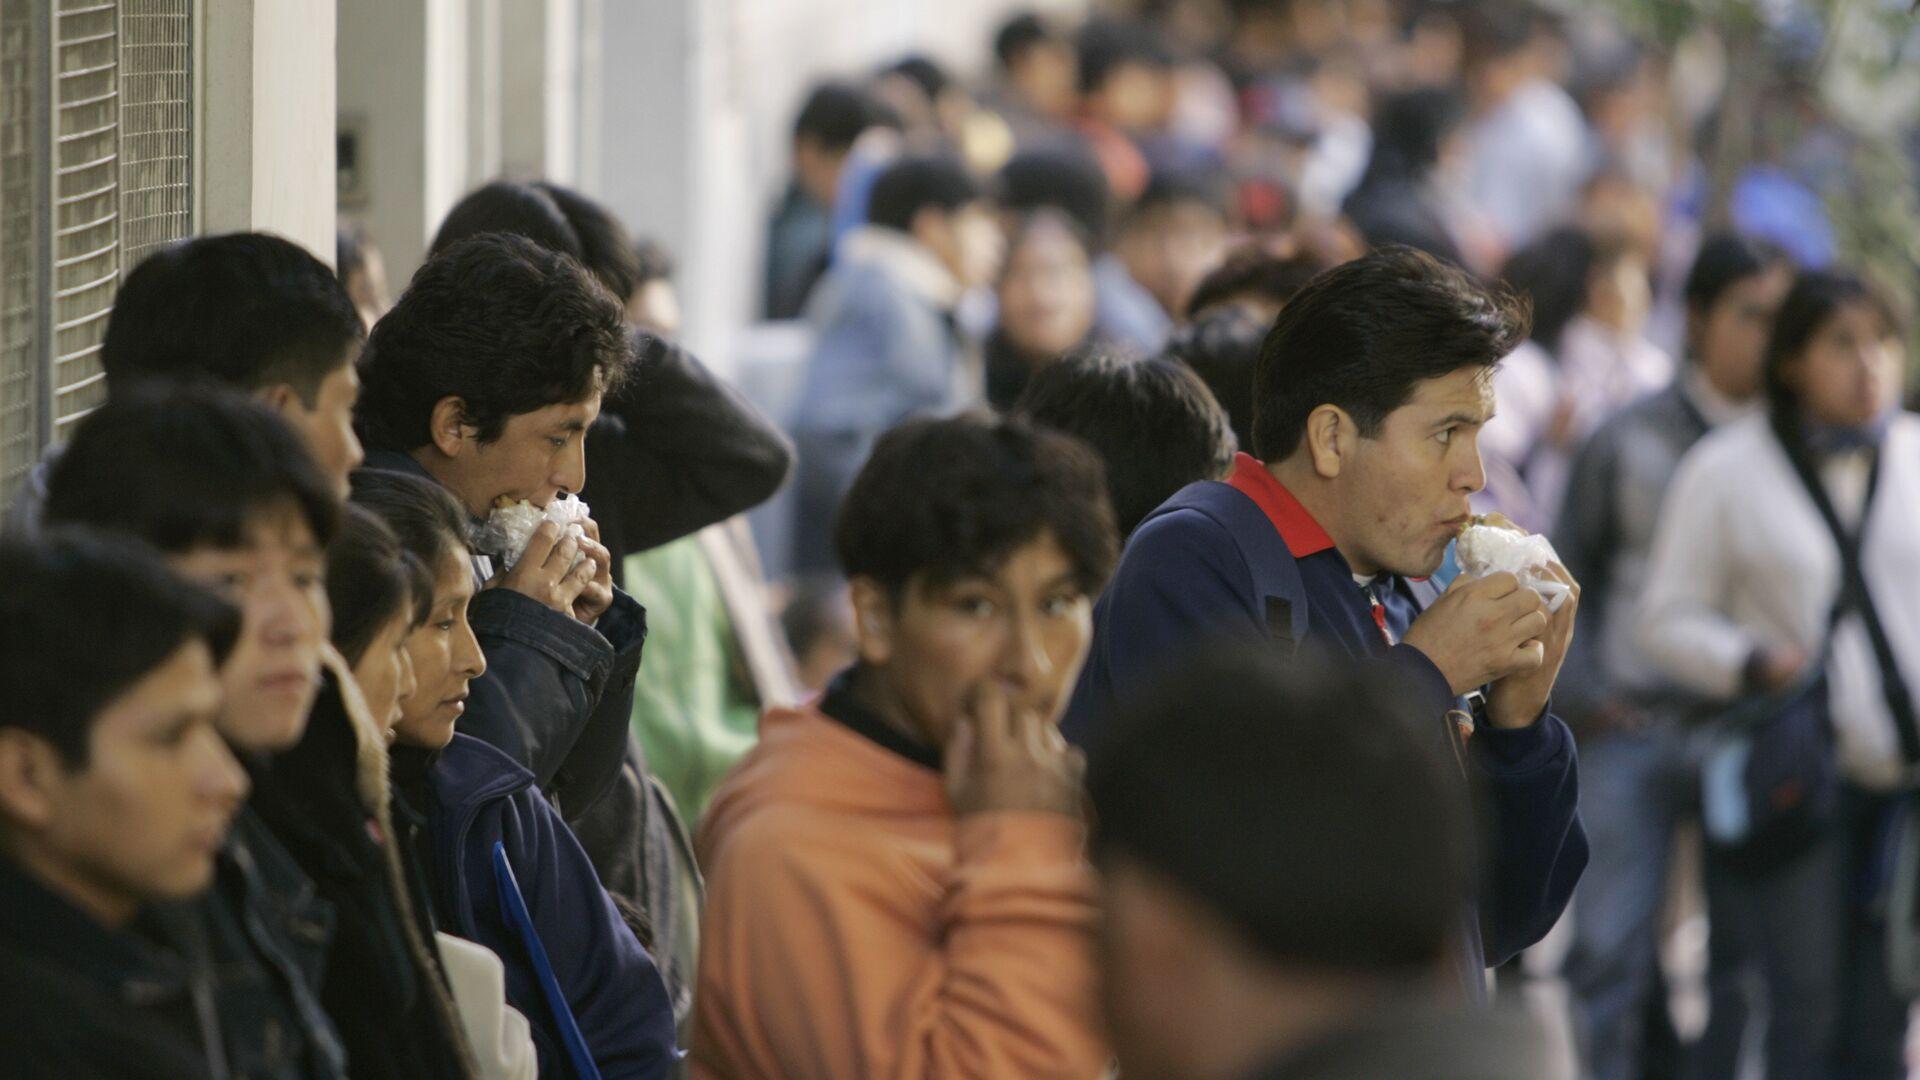 Migrantes ilegales en Buenos Aires - Sputnik Mundo, 1920, 27.08.2021